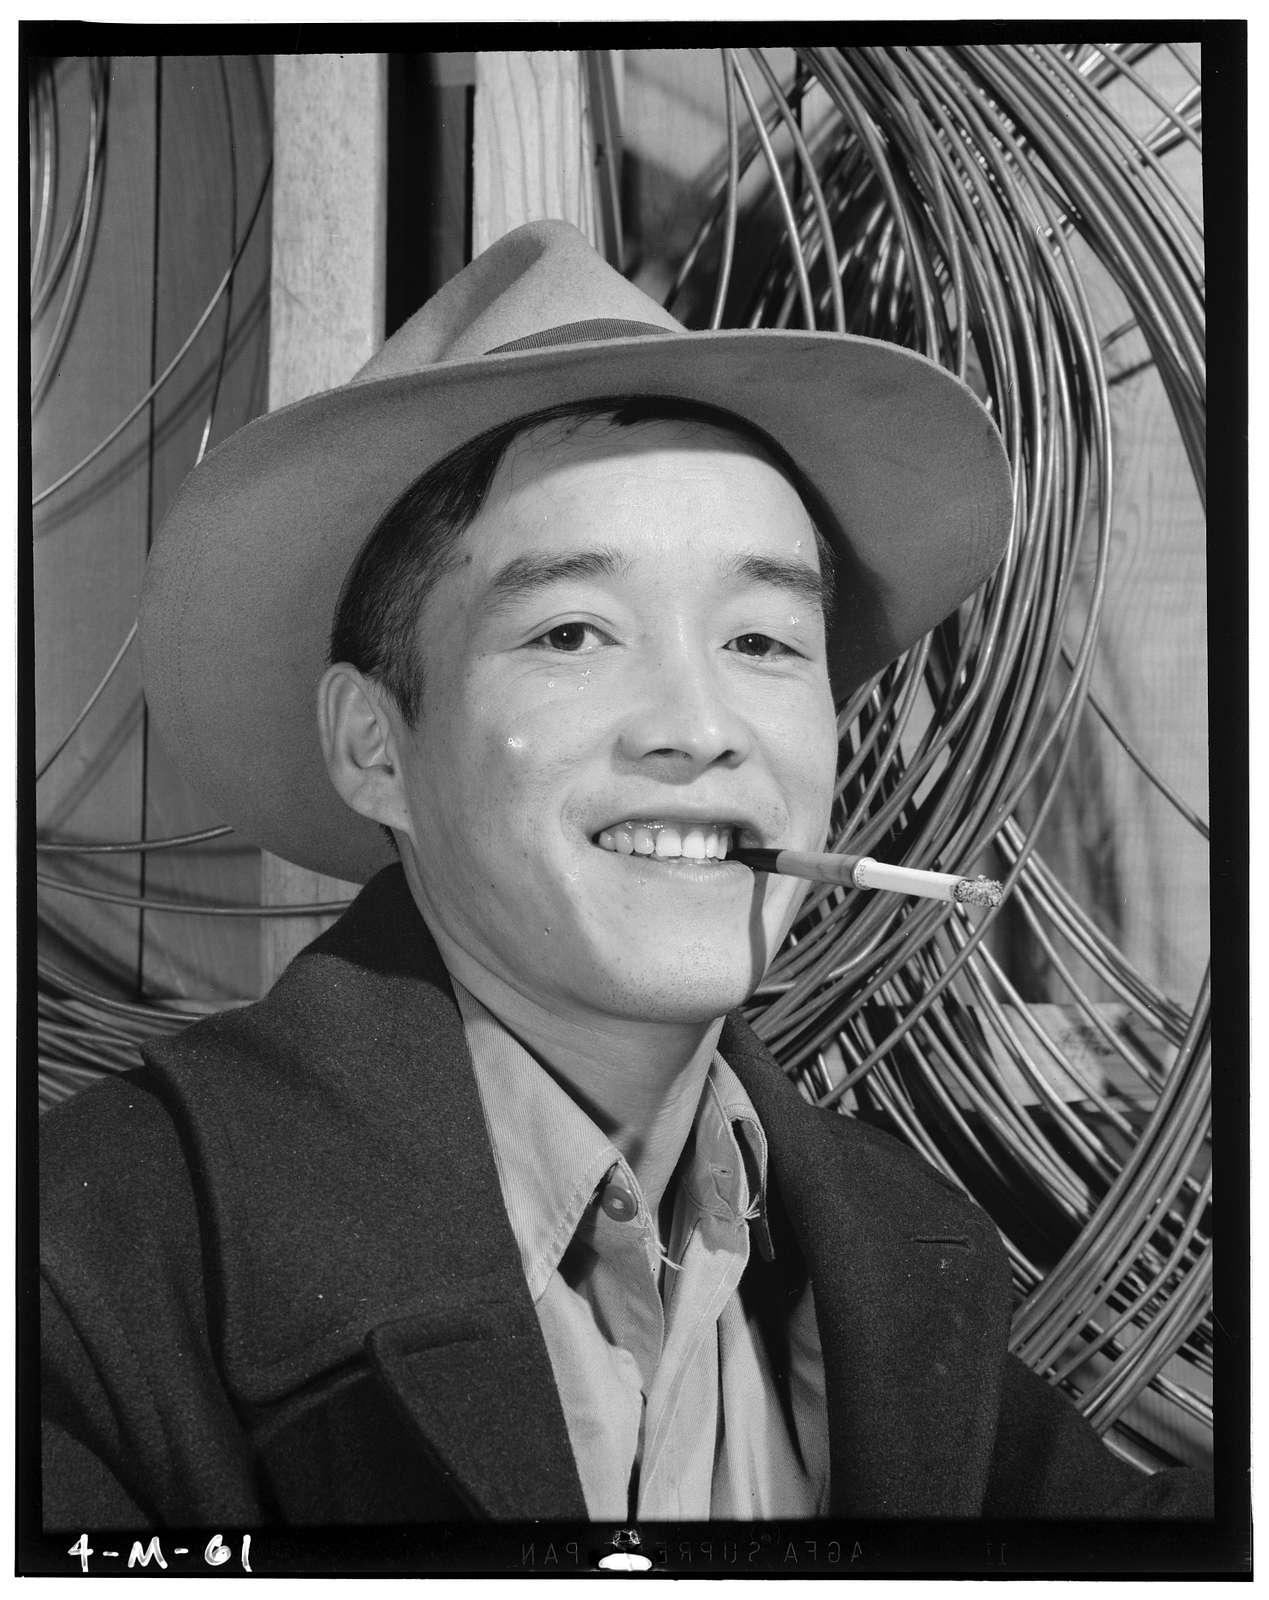 Yonehisa Yamagami, electrician, Manzanar Relocation Center, California / photograph by Ansel Adams.